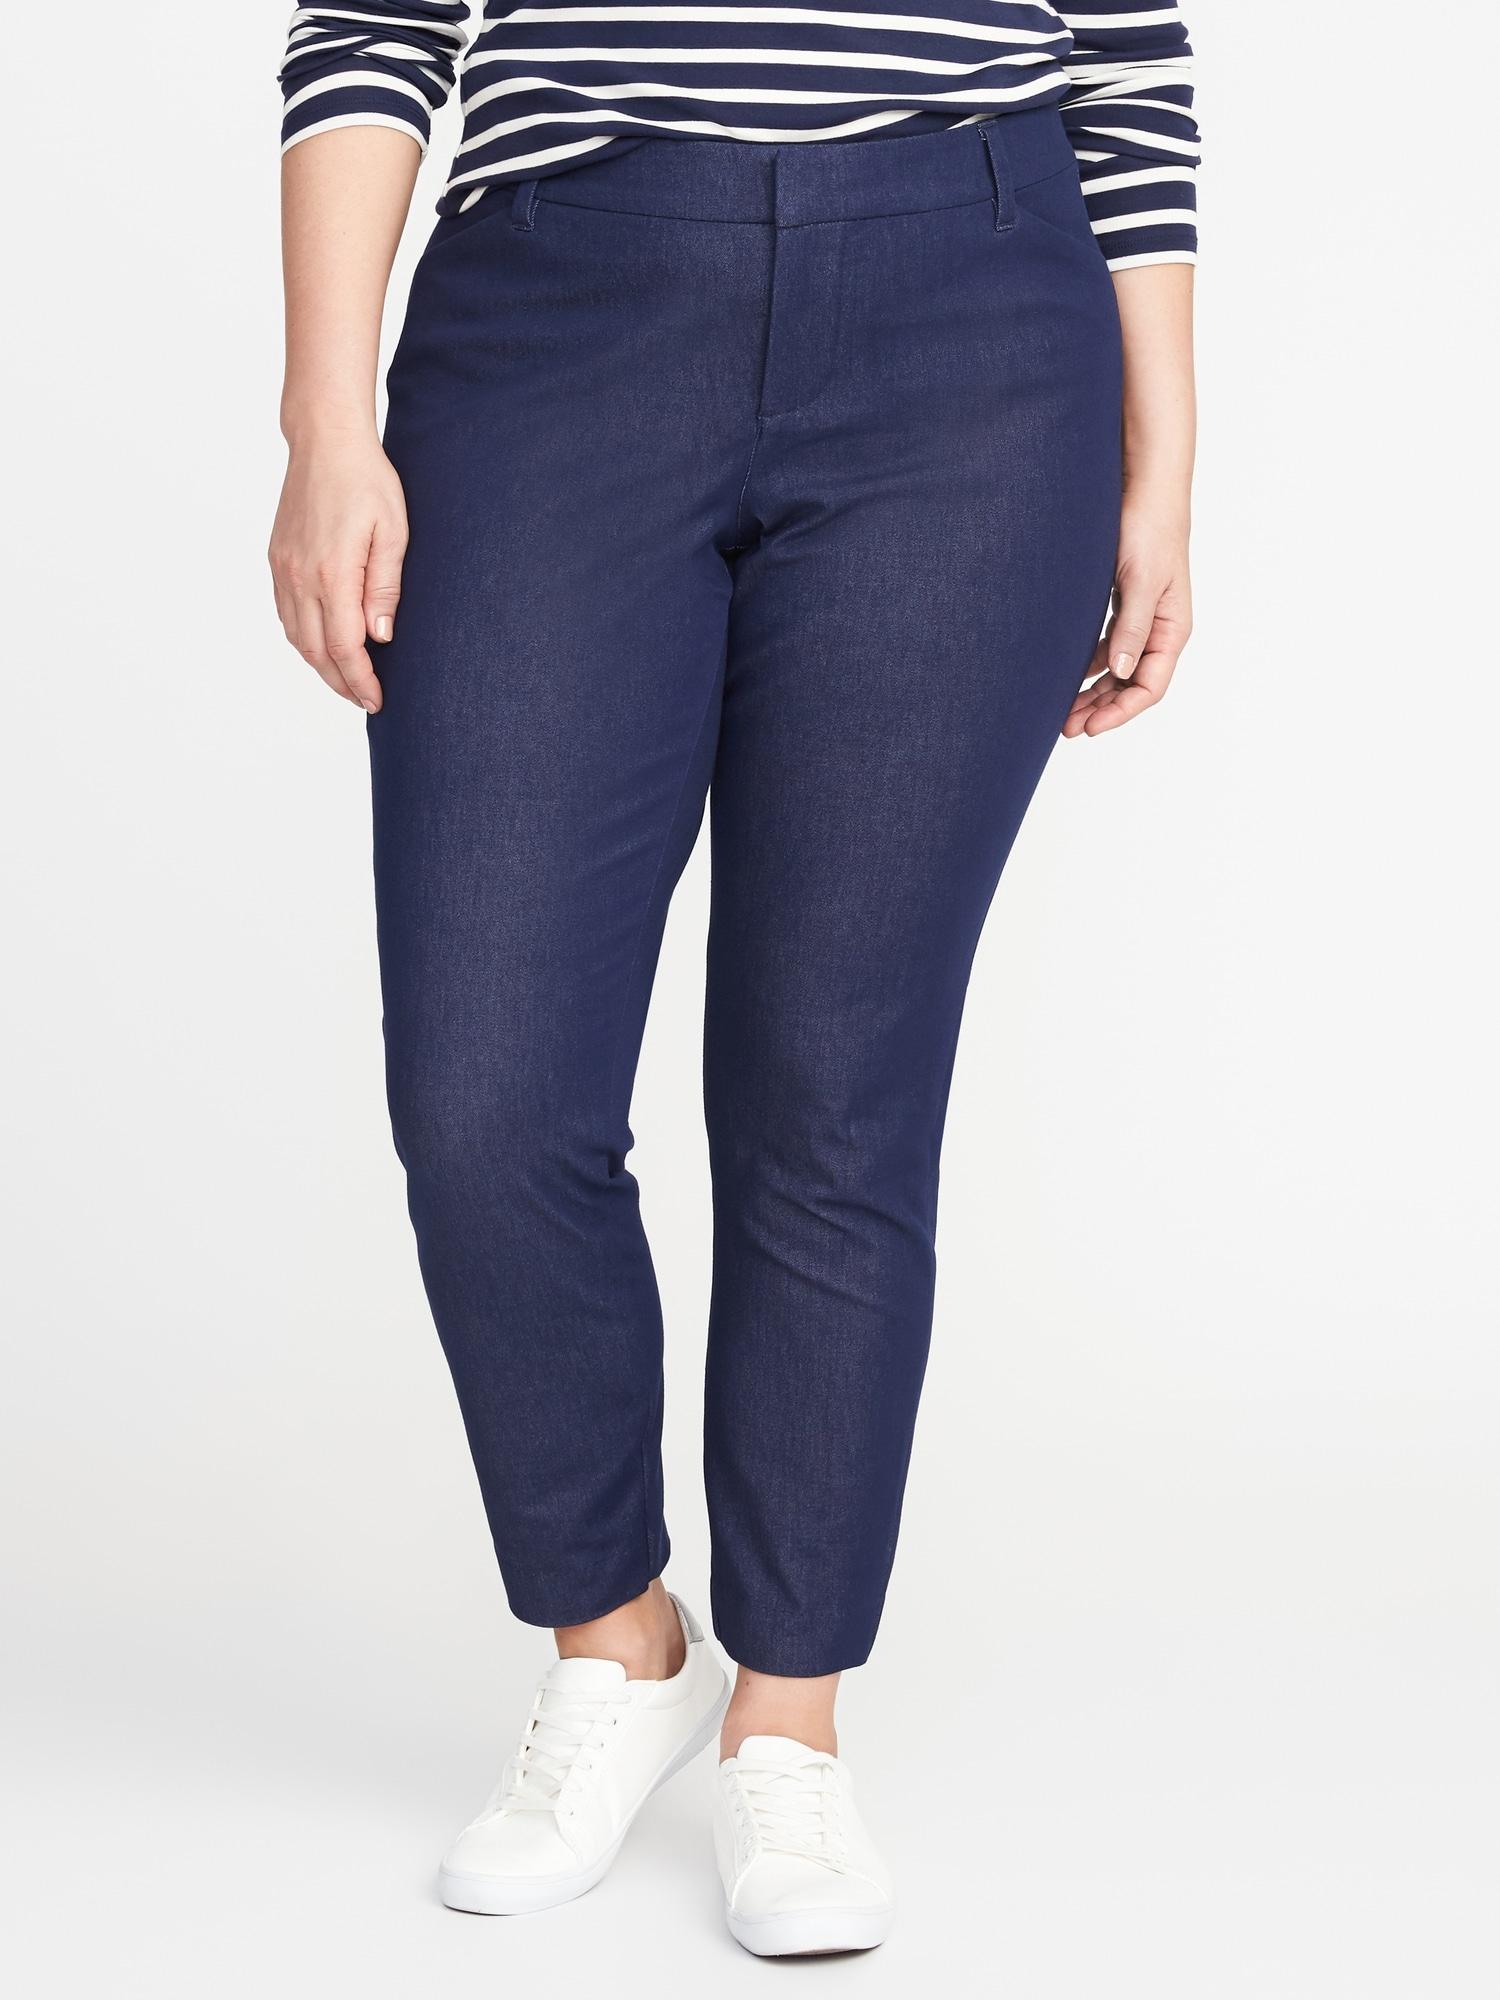 4b203f572b9 Mid-Rise Secret-Slim Pockets Plus-Size Pixie Pants